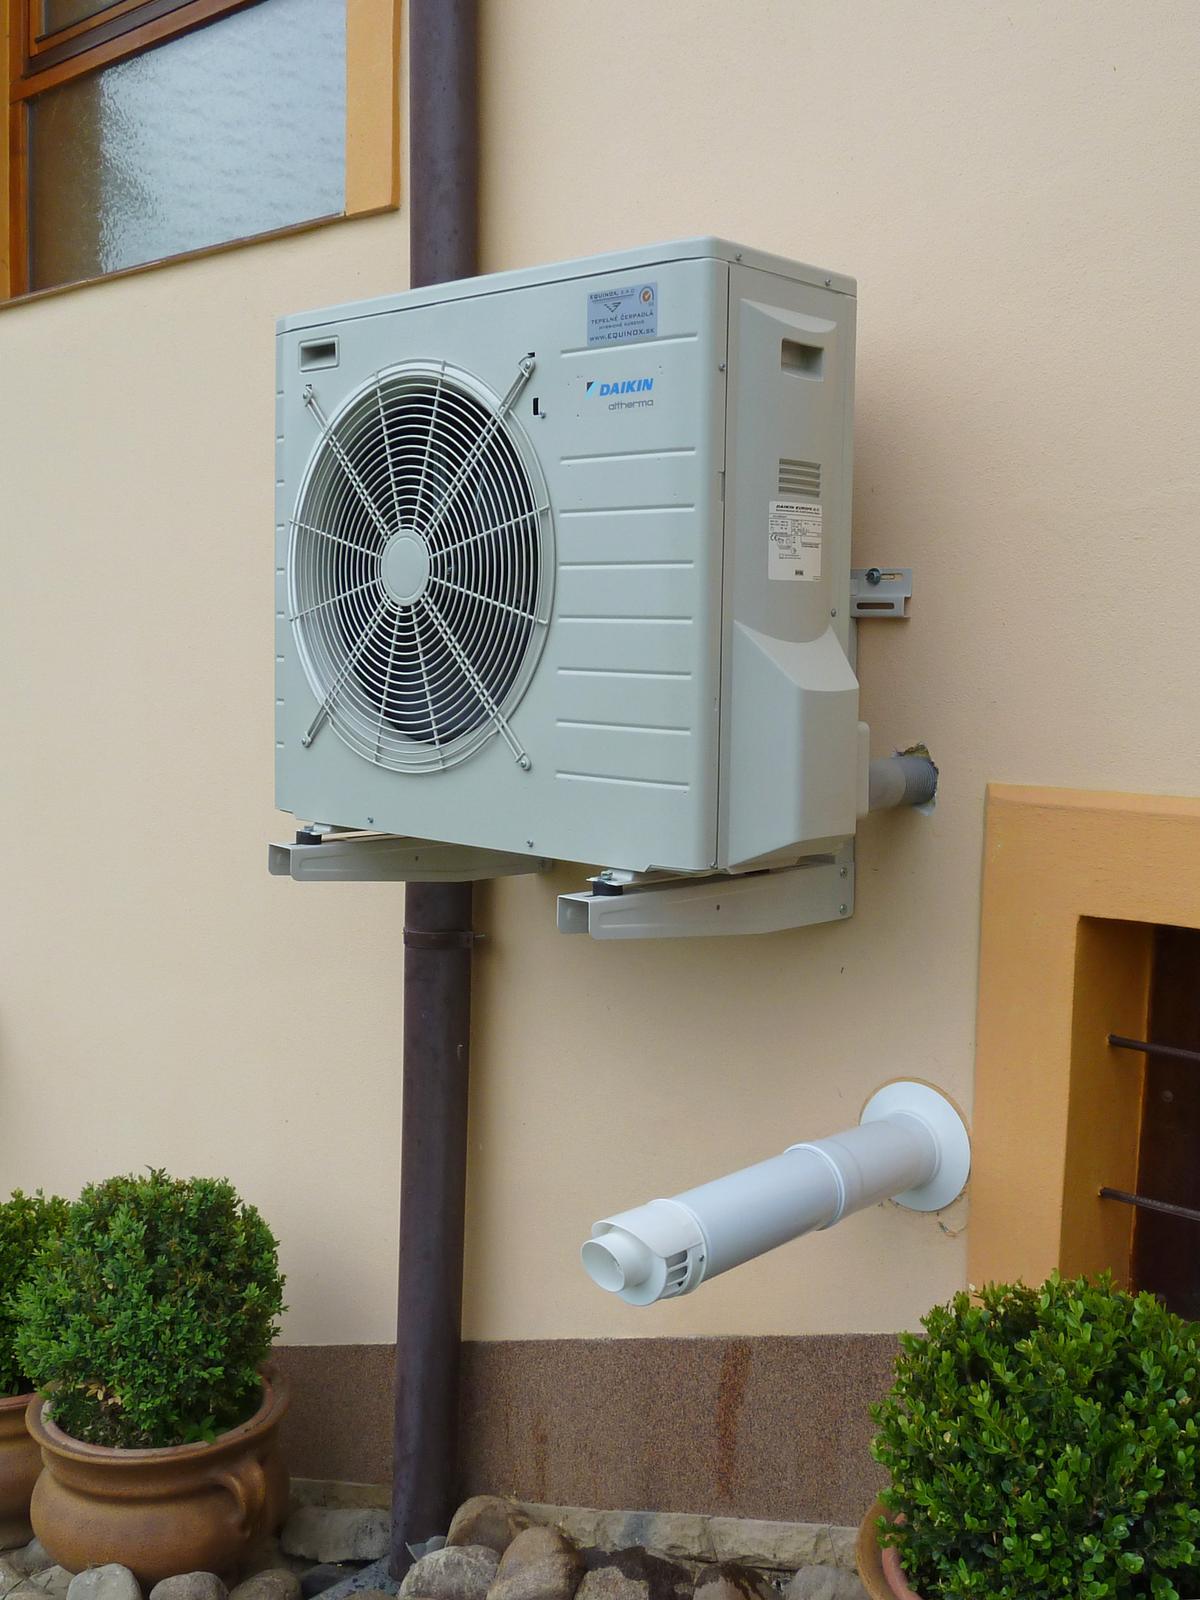 equinox - Hybridné tepelné čerpadlo